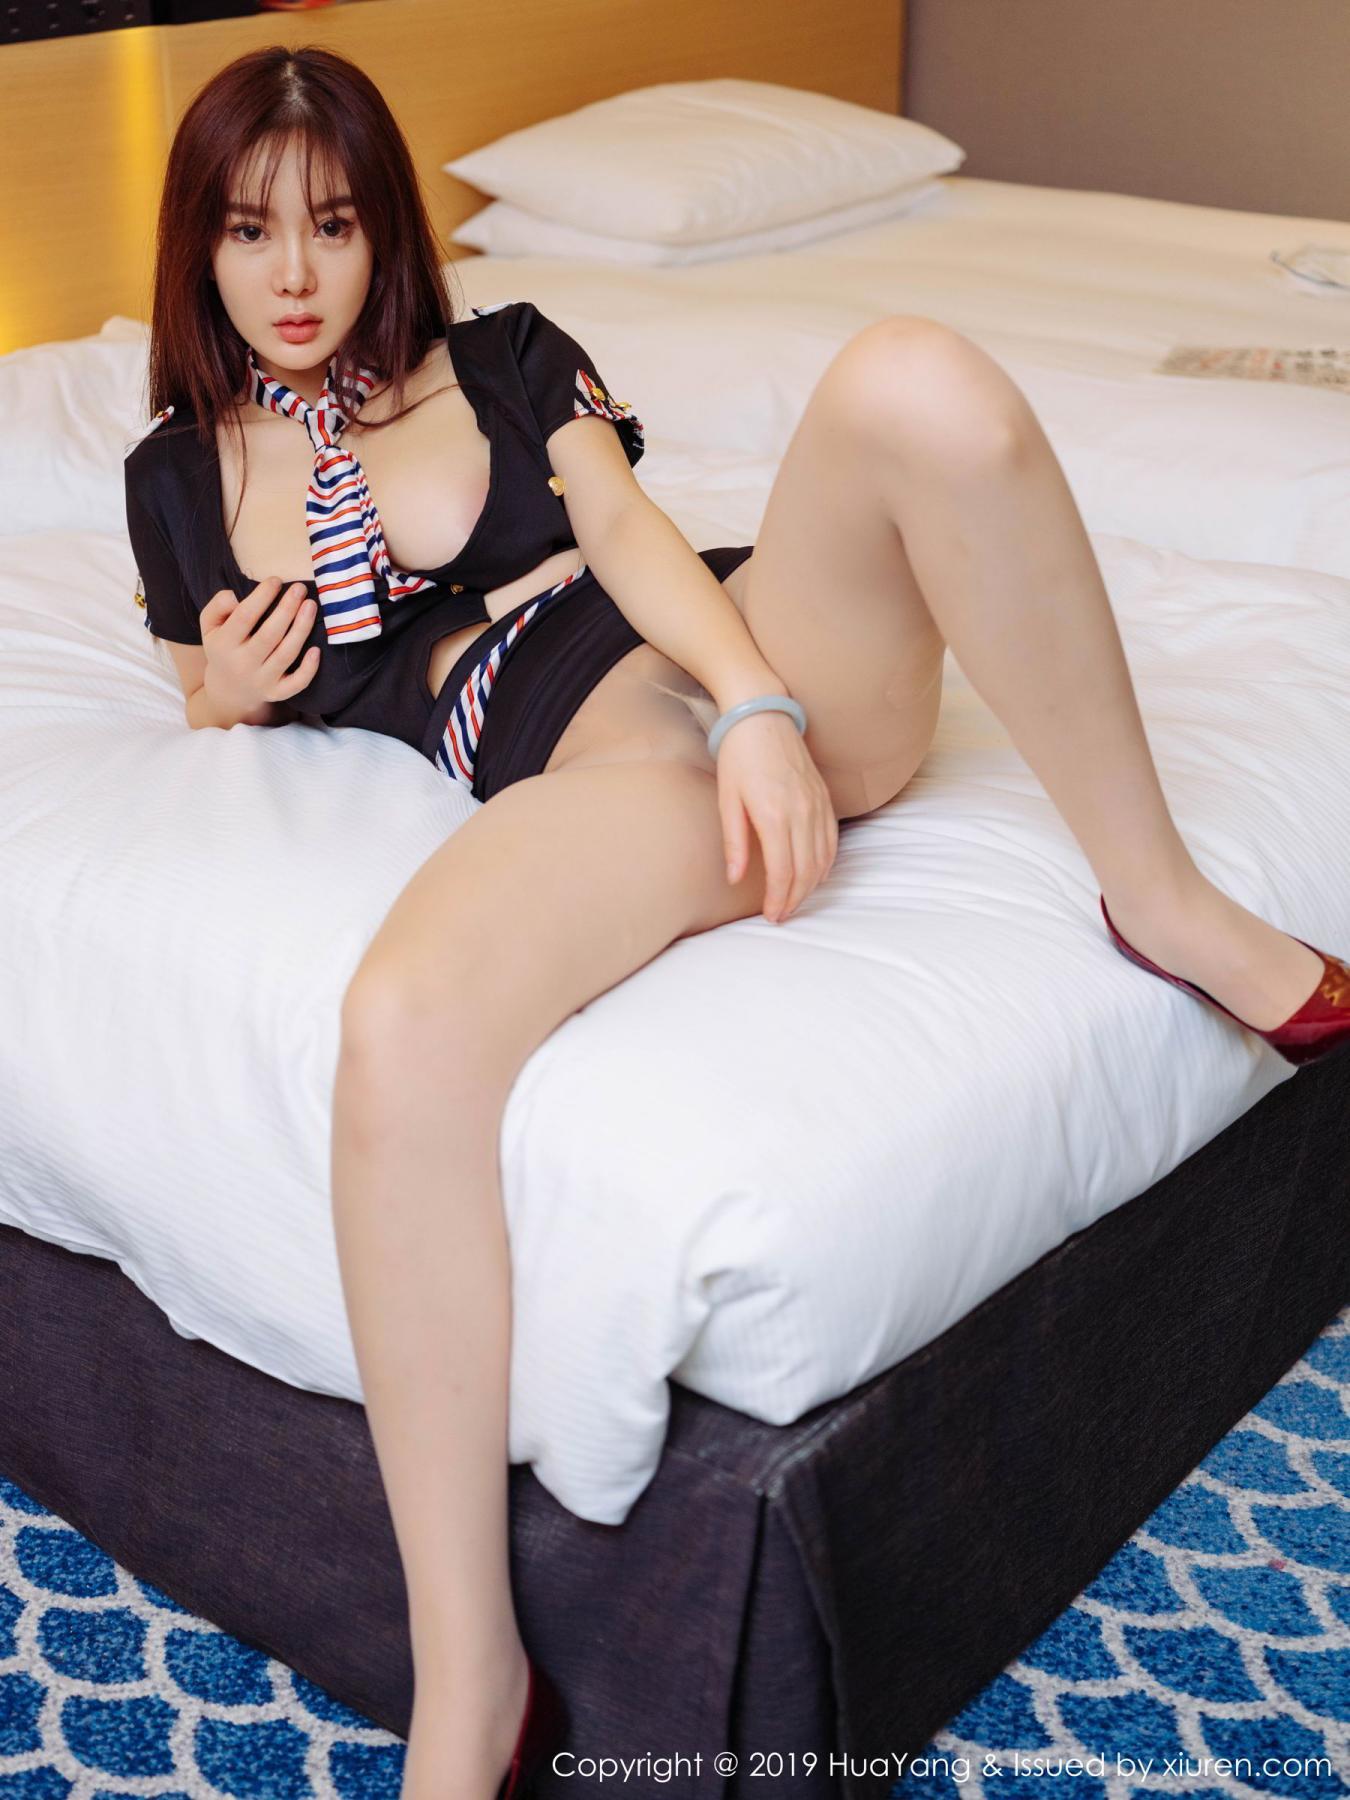 [Huayang] Vol.128 Yi Yang 11P, Adult, HuaYang, Yi Yang